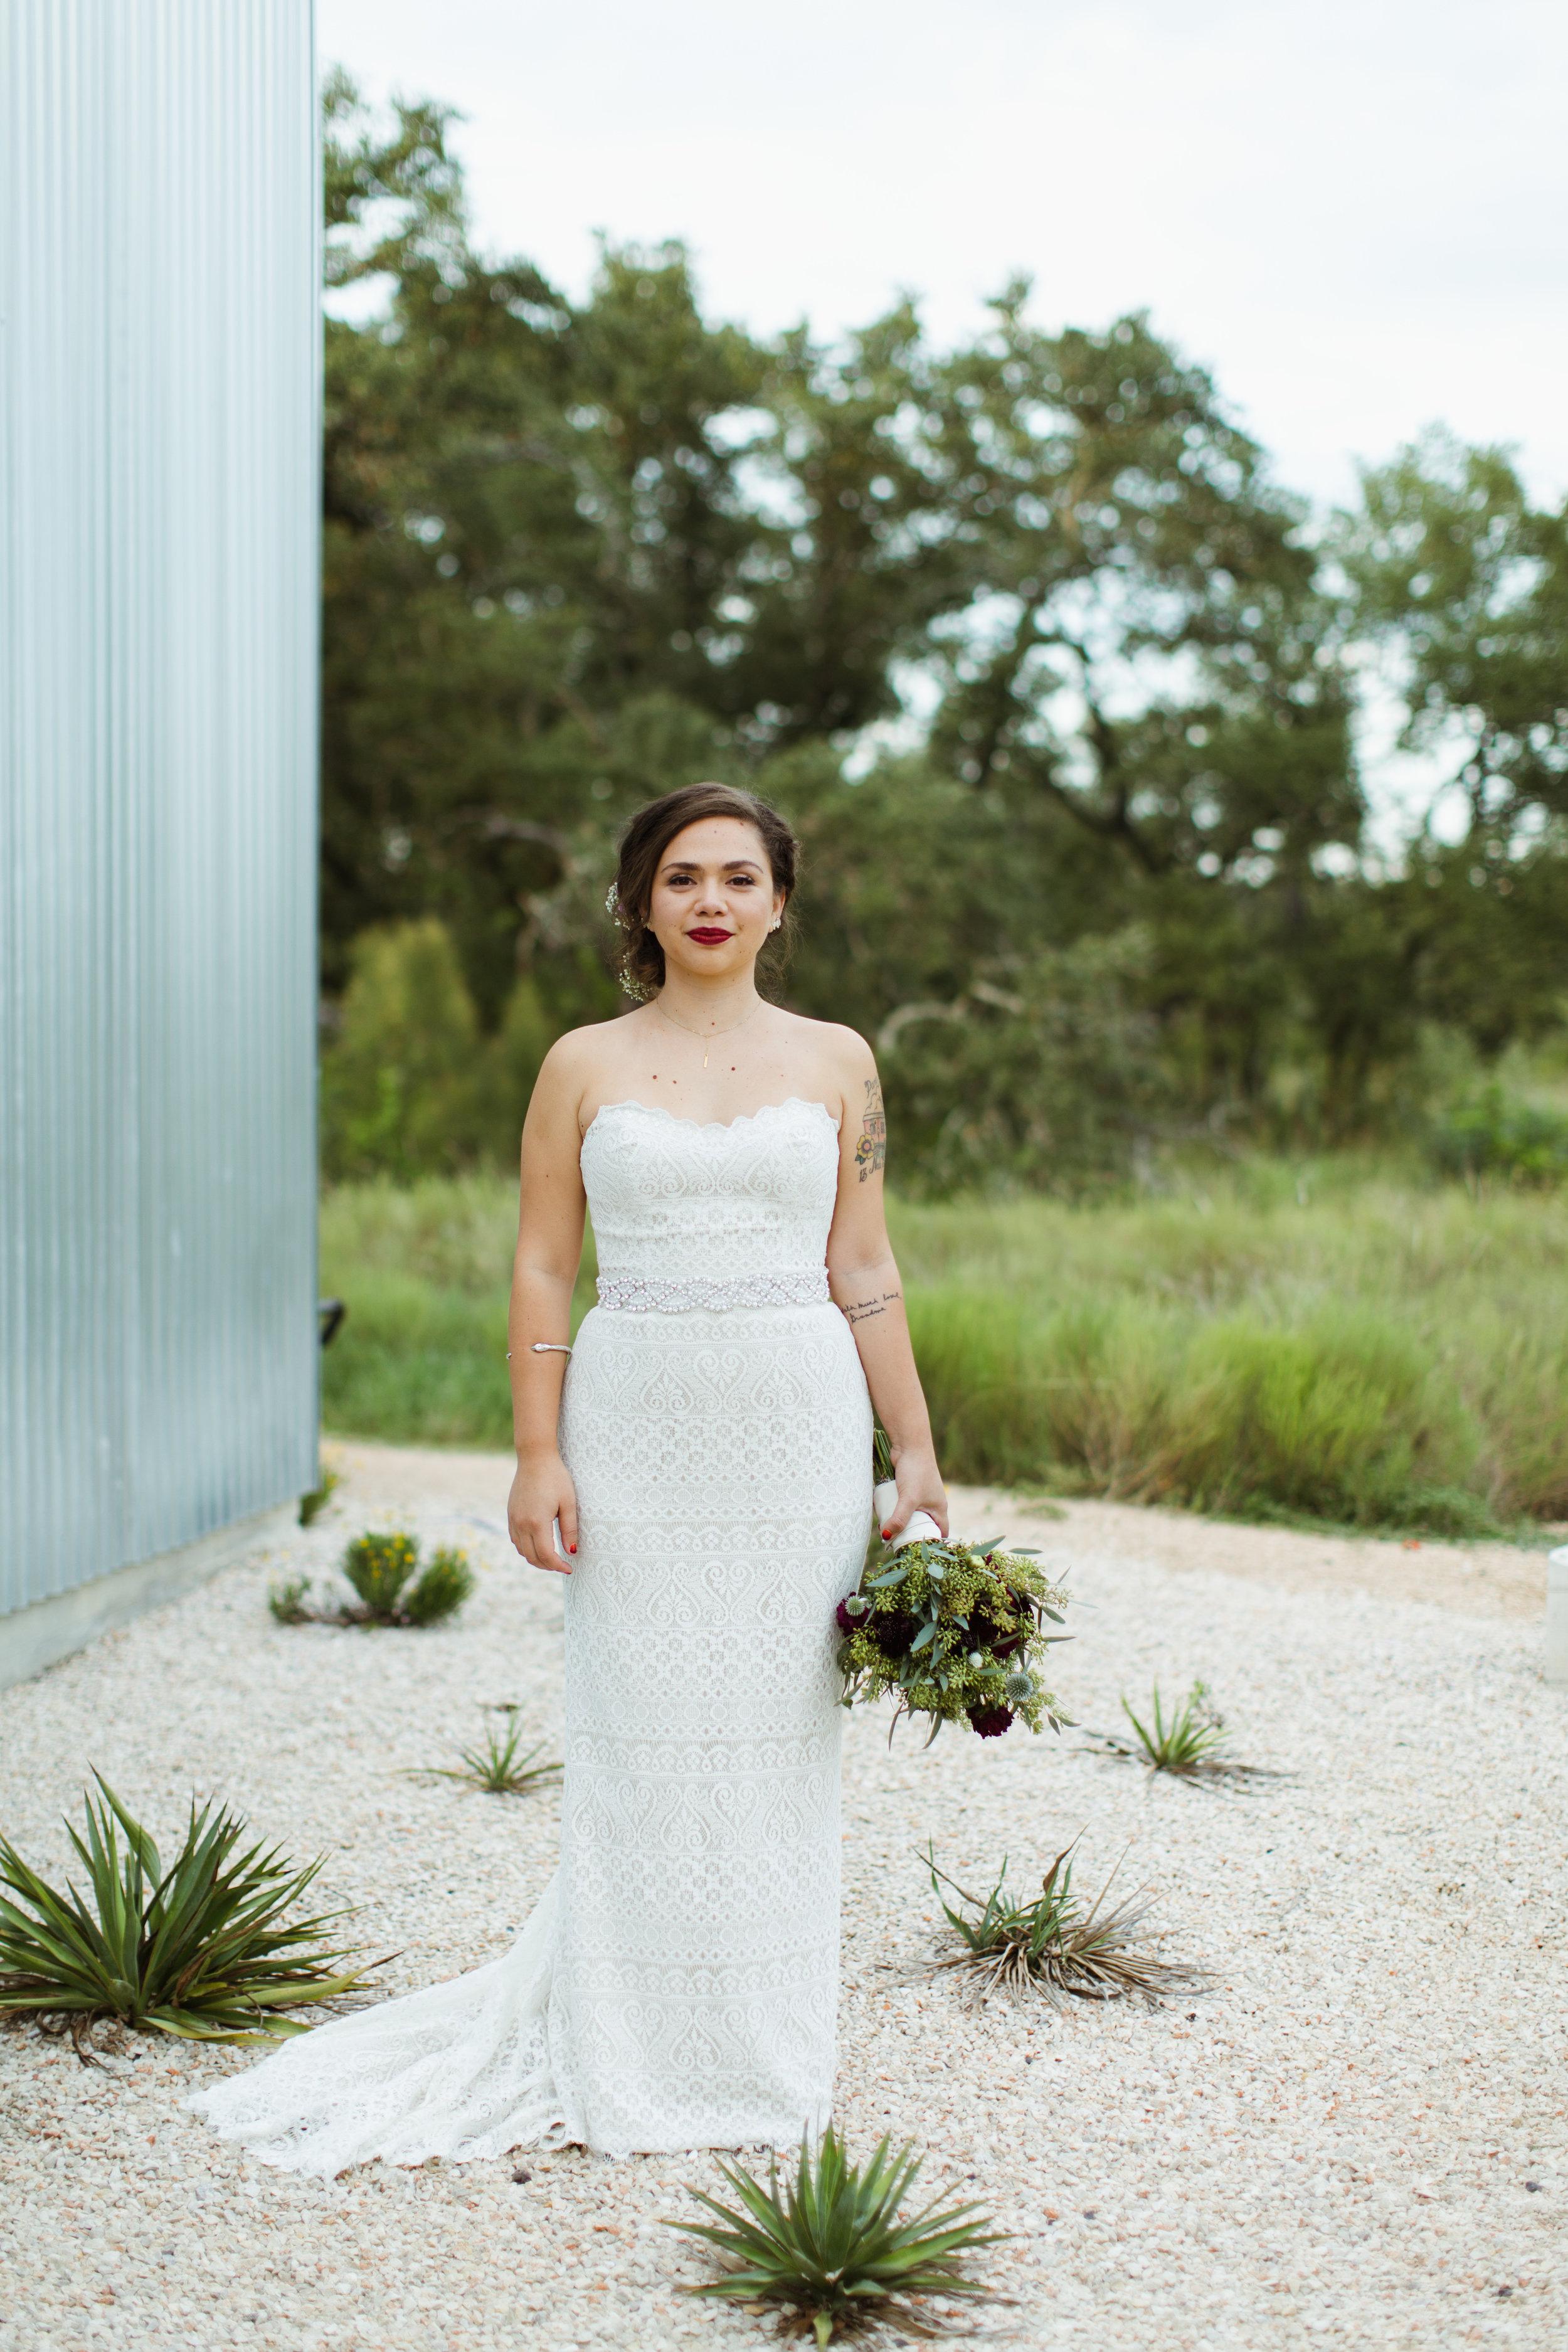 Paige-Newton-Destination-Wedding-Photography-Prospect-House-Bridal-Shoot.jpg